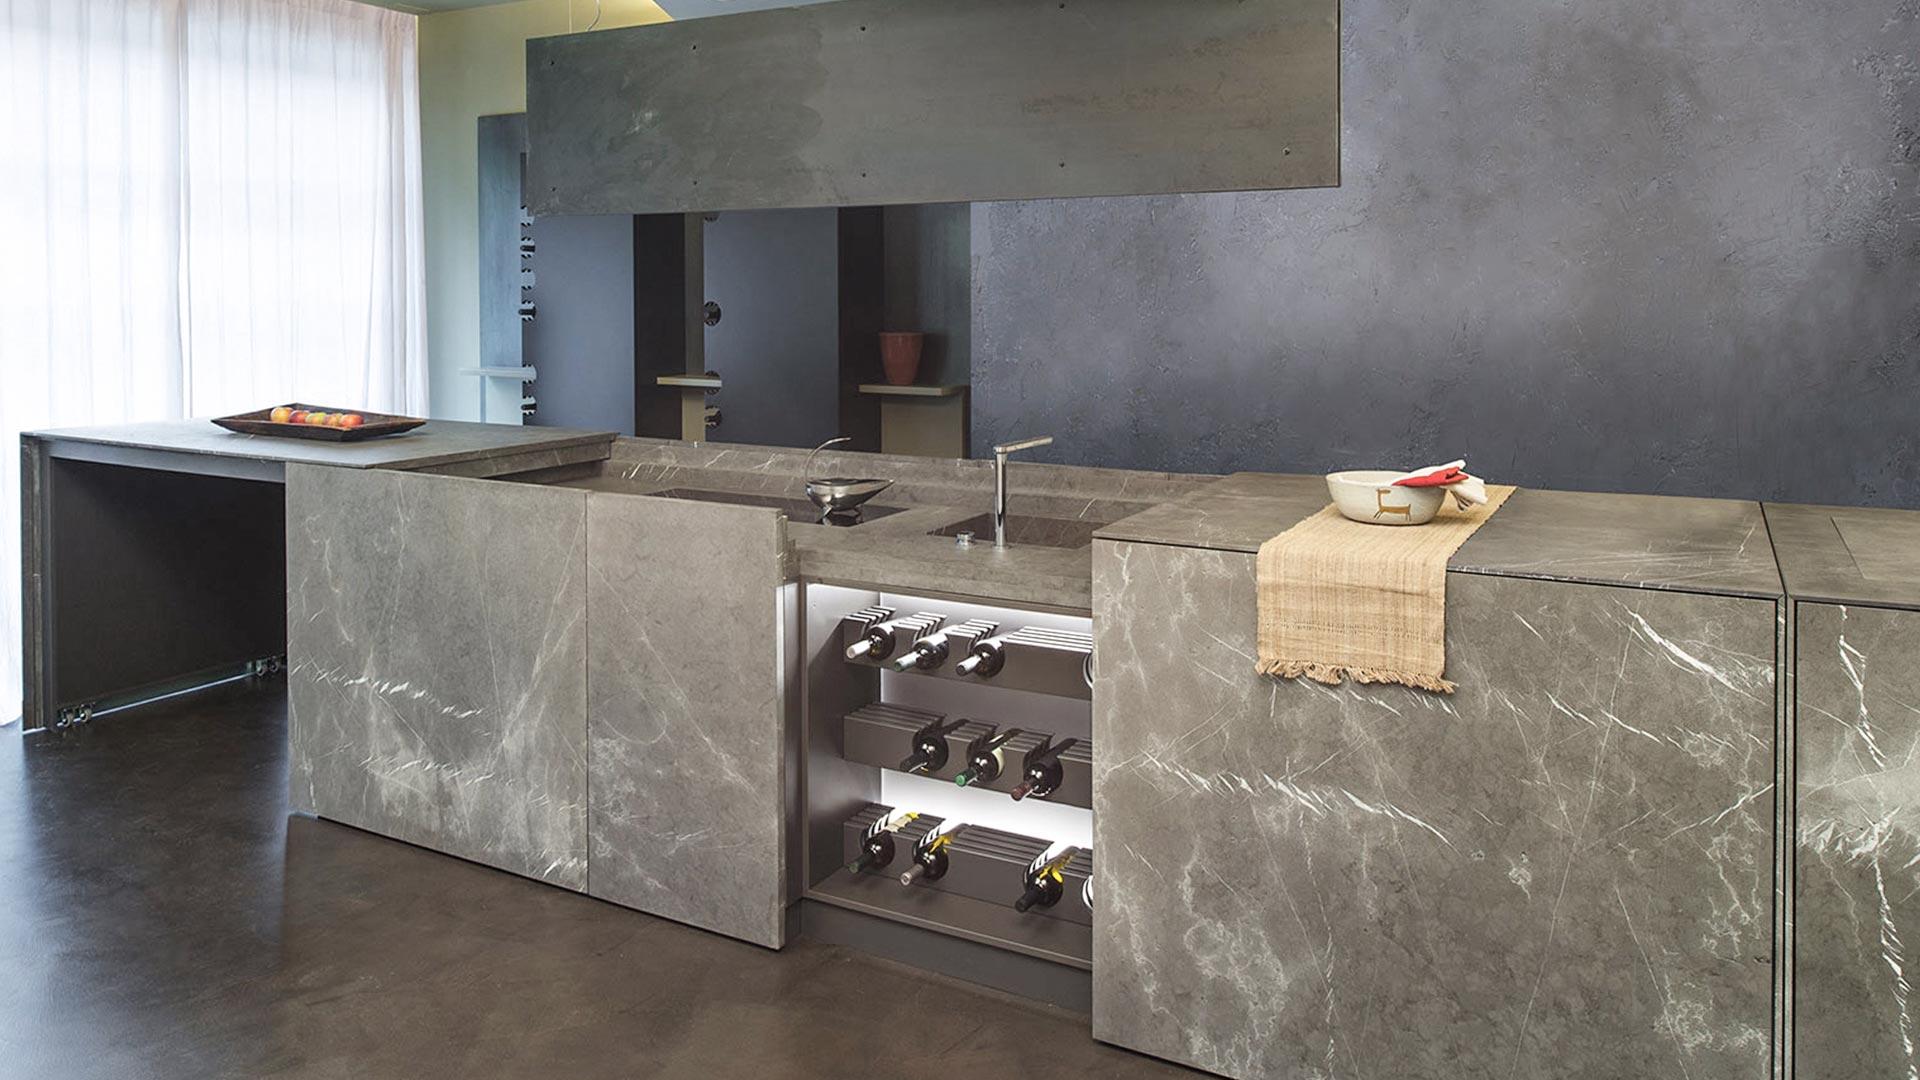 Una cucina monoblocco a scomparsa in pietra di corinto - Cucina monoblocco a scomparsa ...